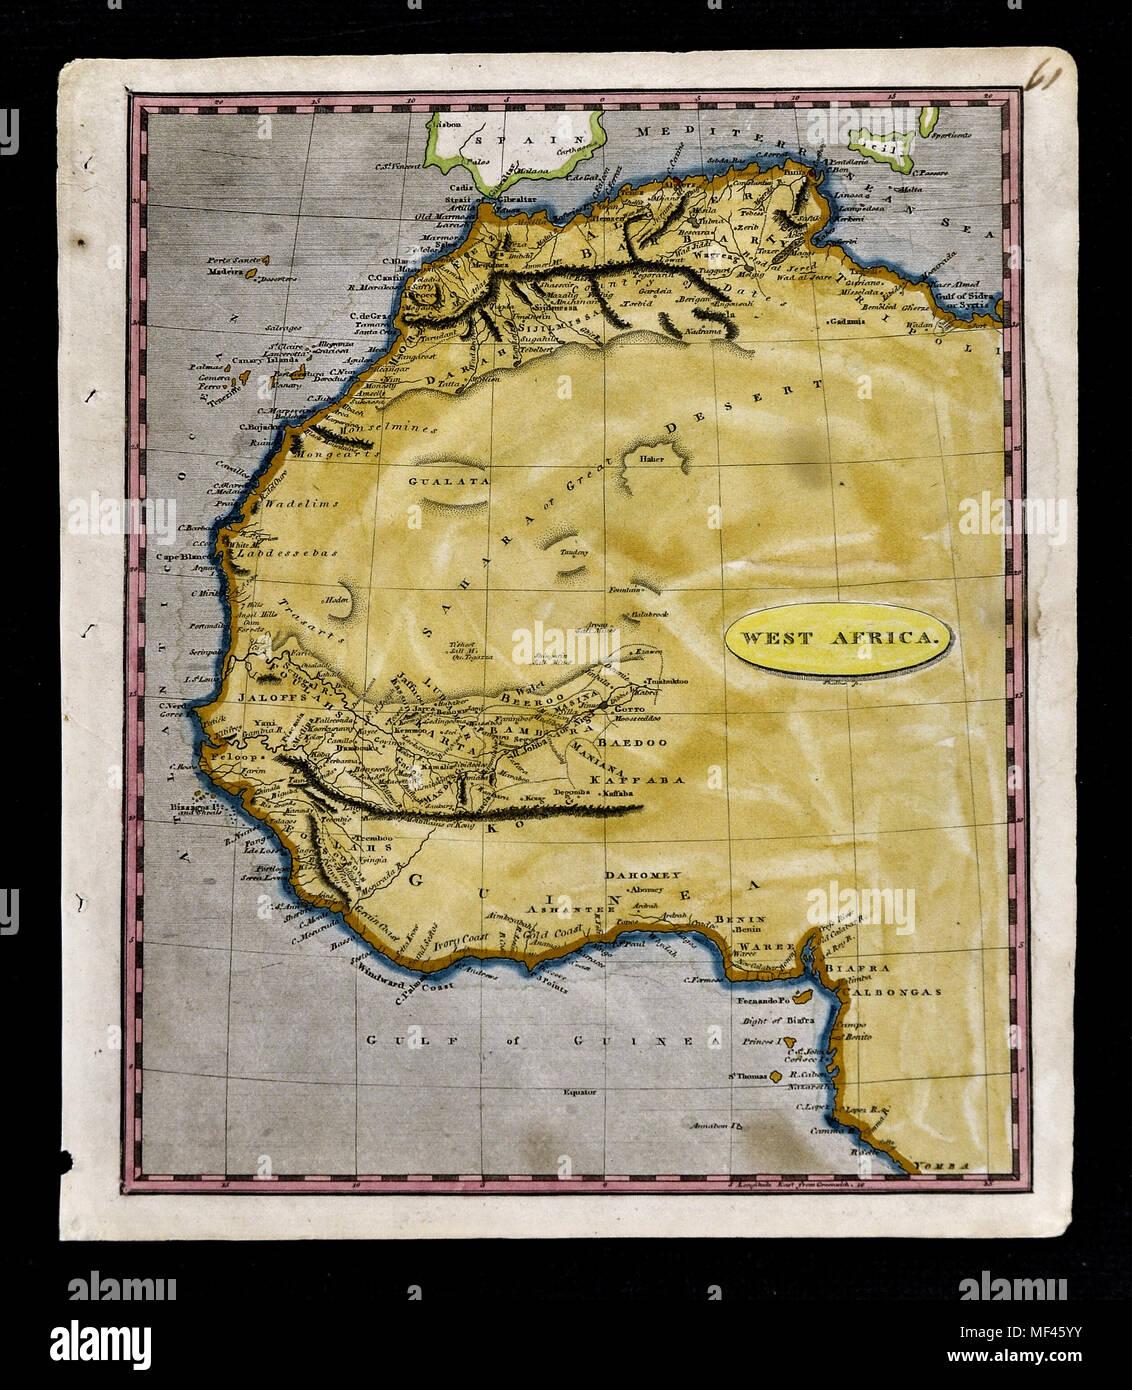 Desierto Del Sahara Mapa.1804 Arrowsmith Mapa Noroeste De Africa Marruecos Costa